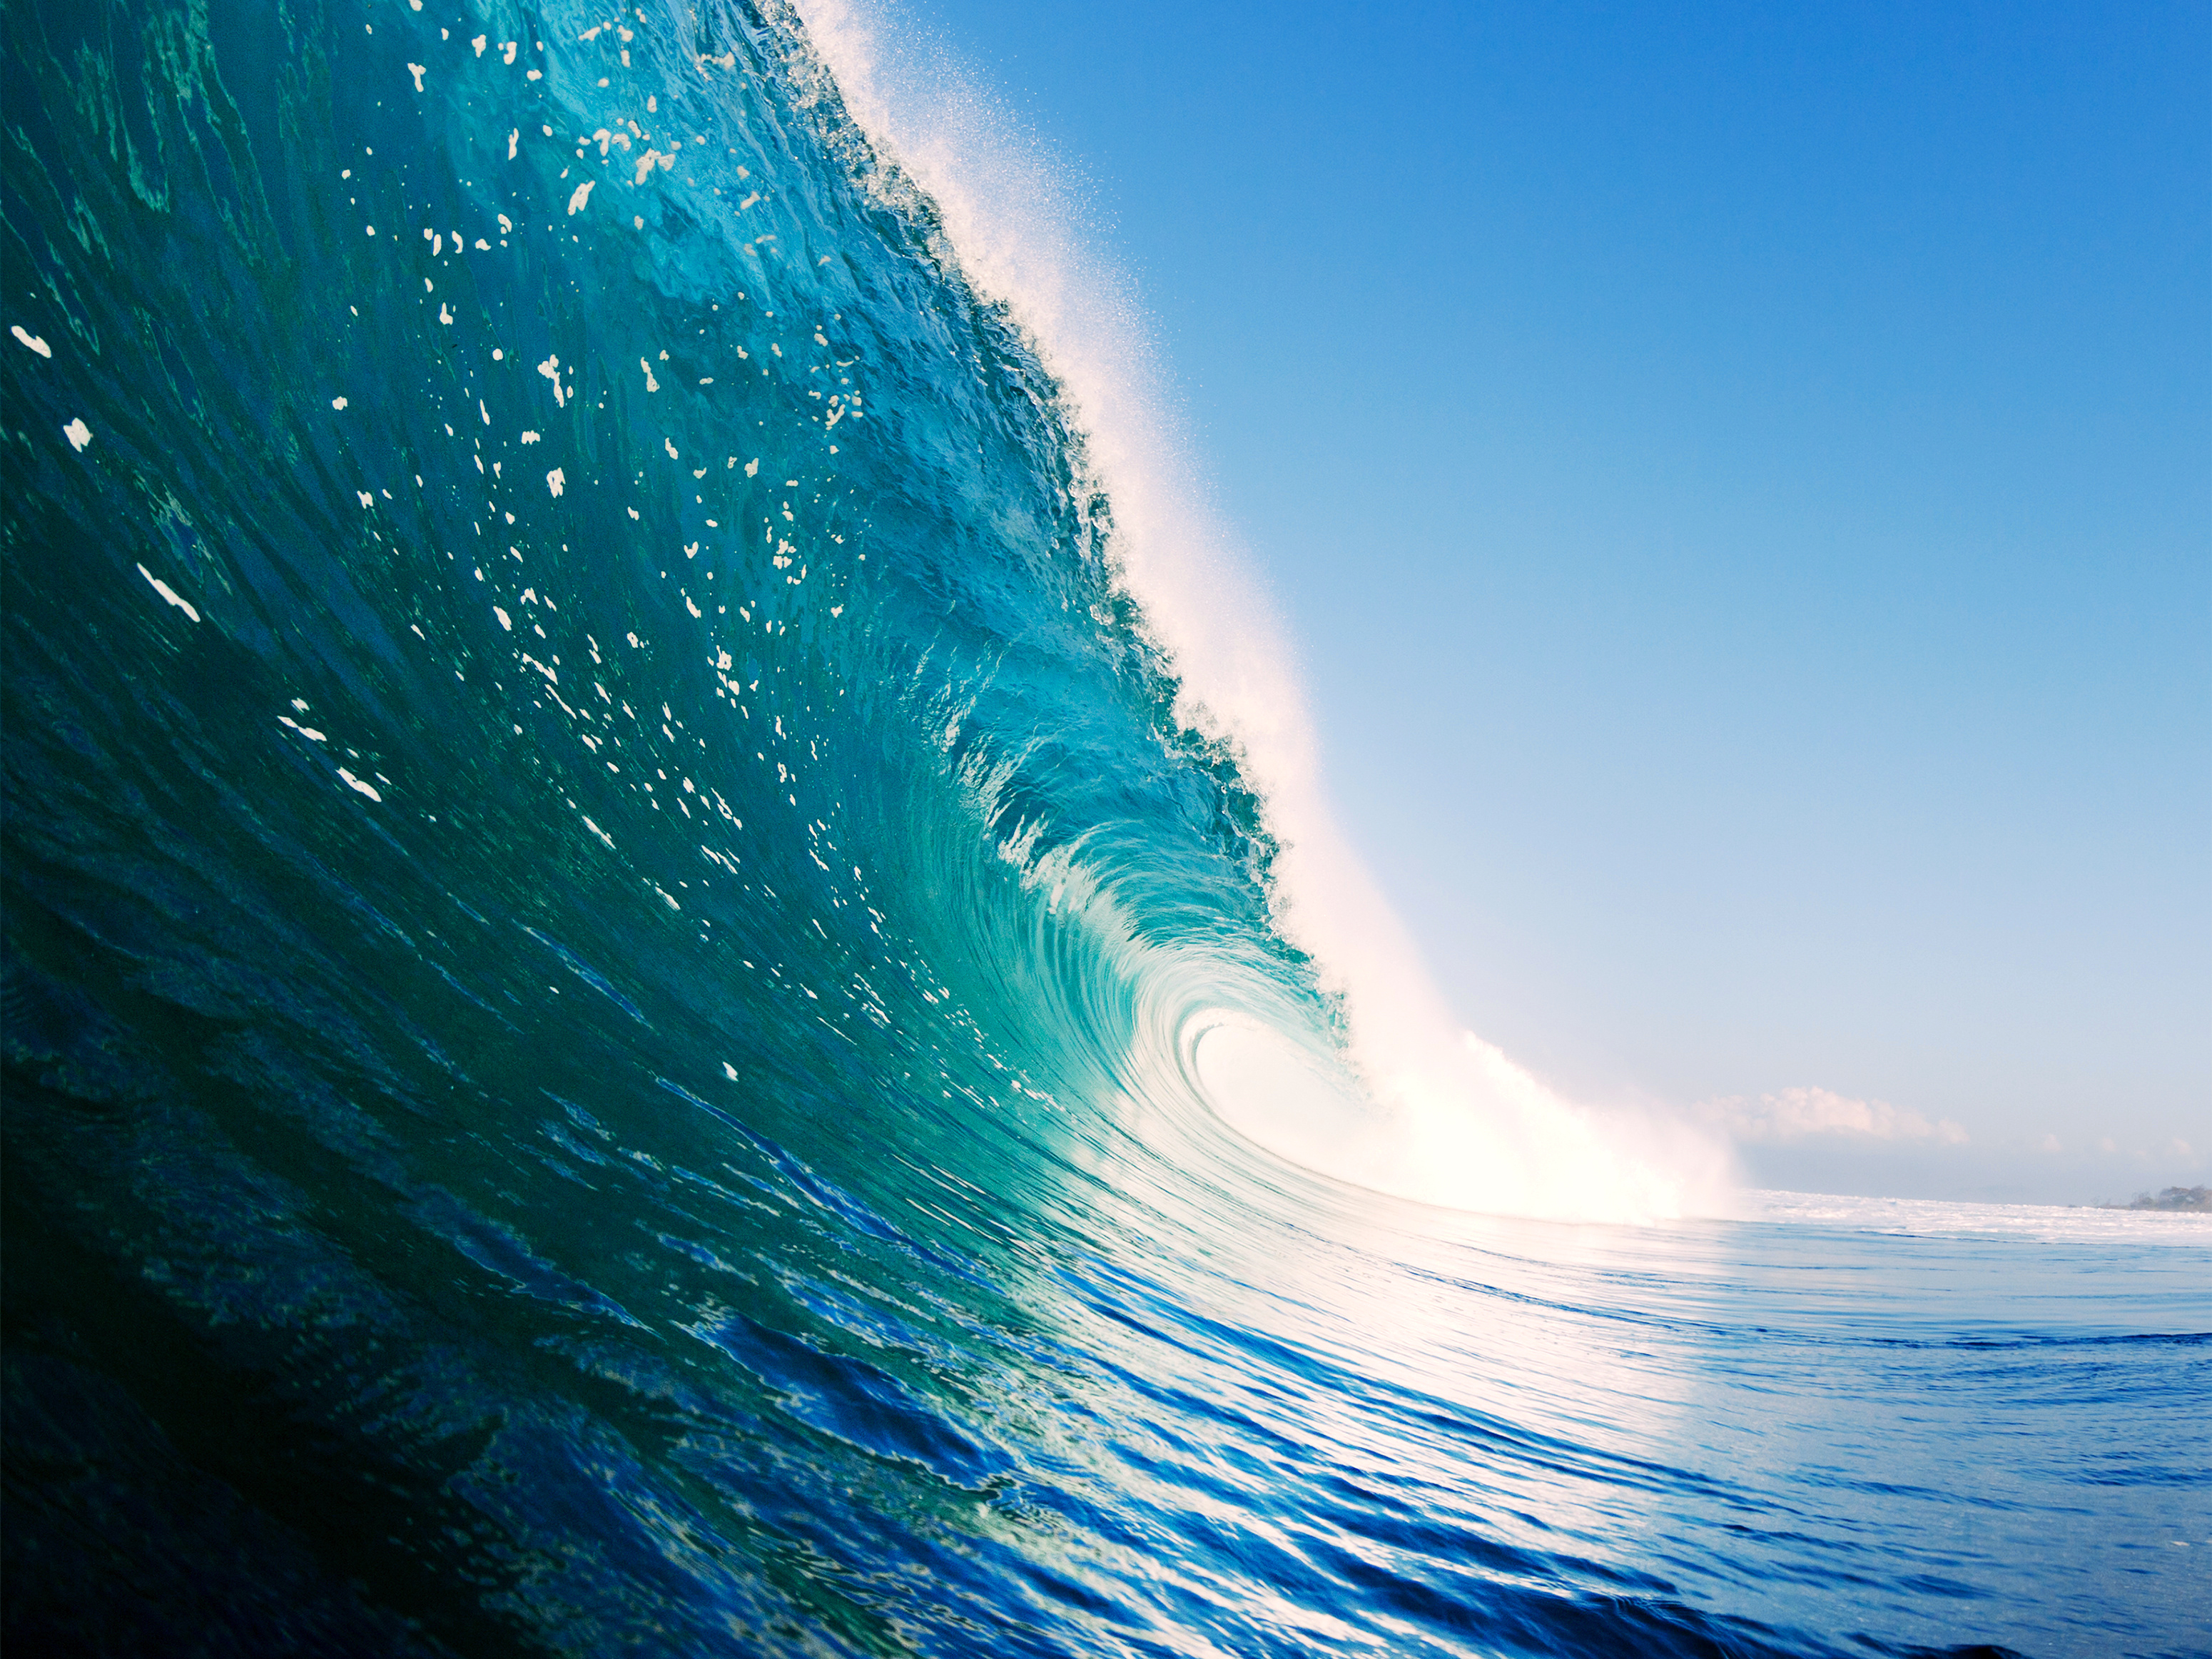 увидеть во сне море с волнами путайте термобелье нижним